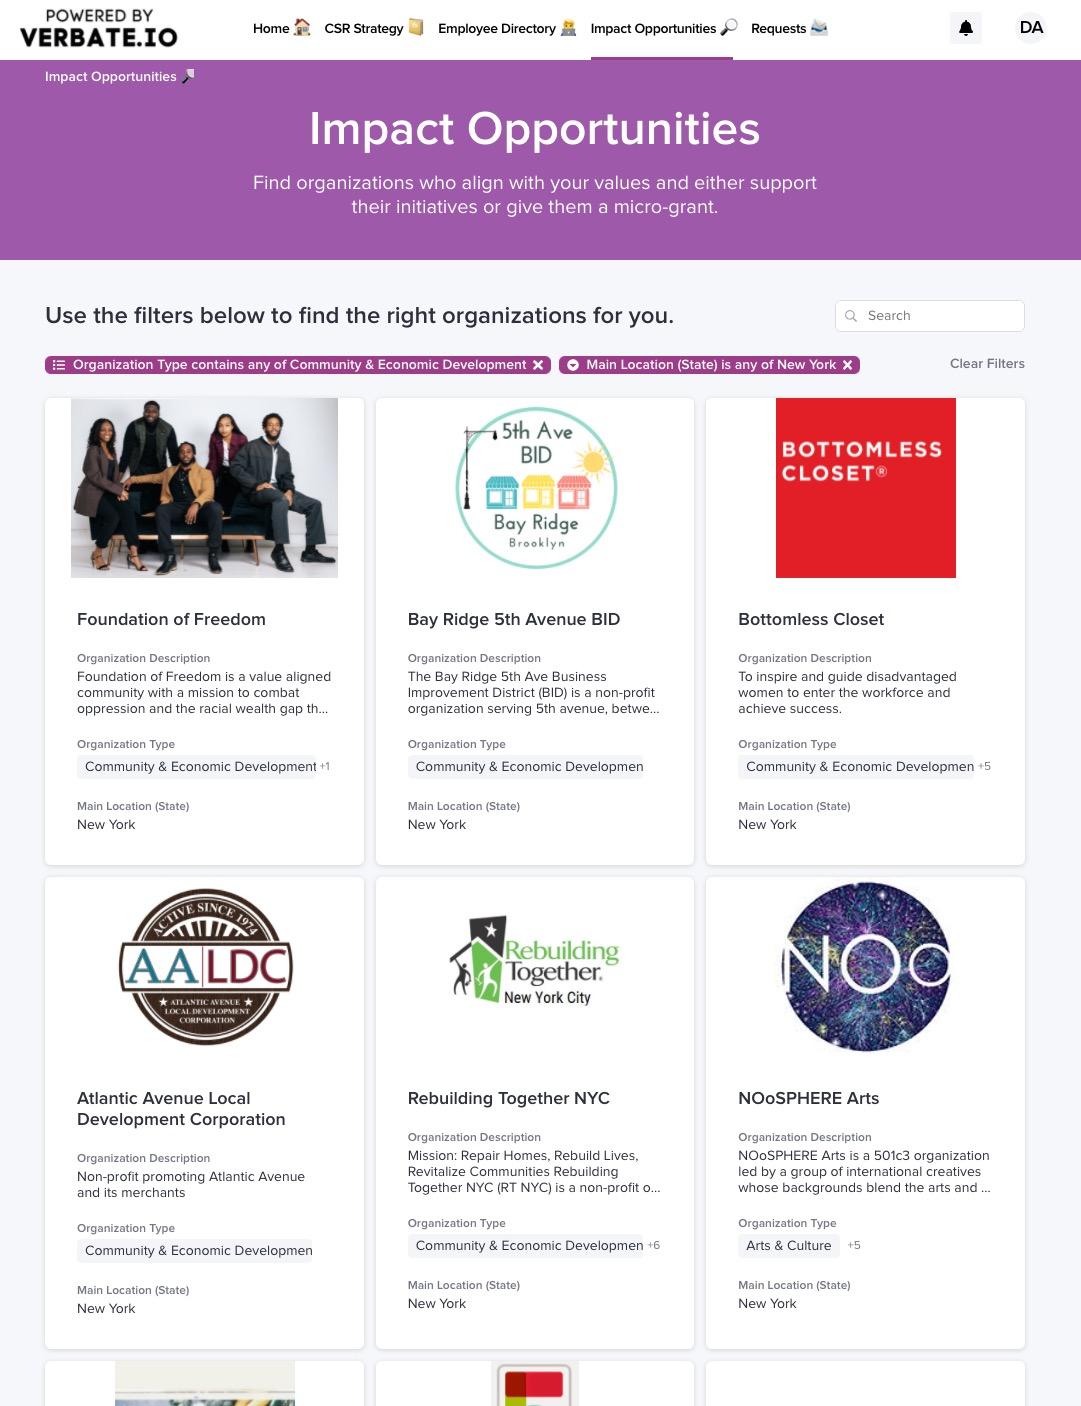 Verbate screenshot of community impact opportunities.